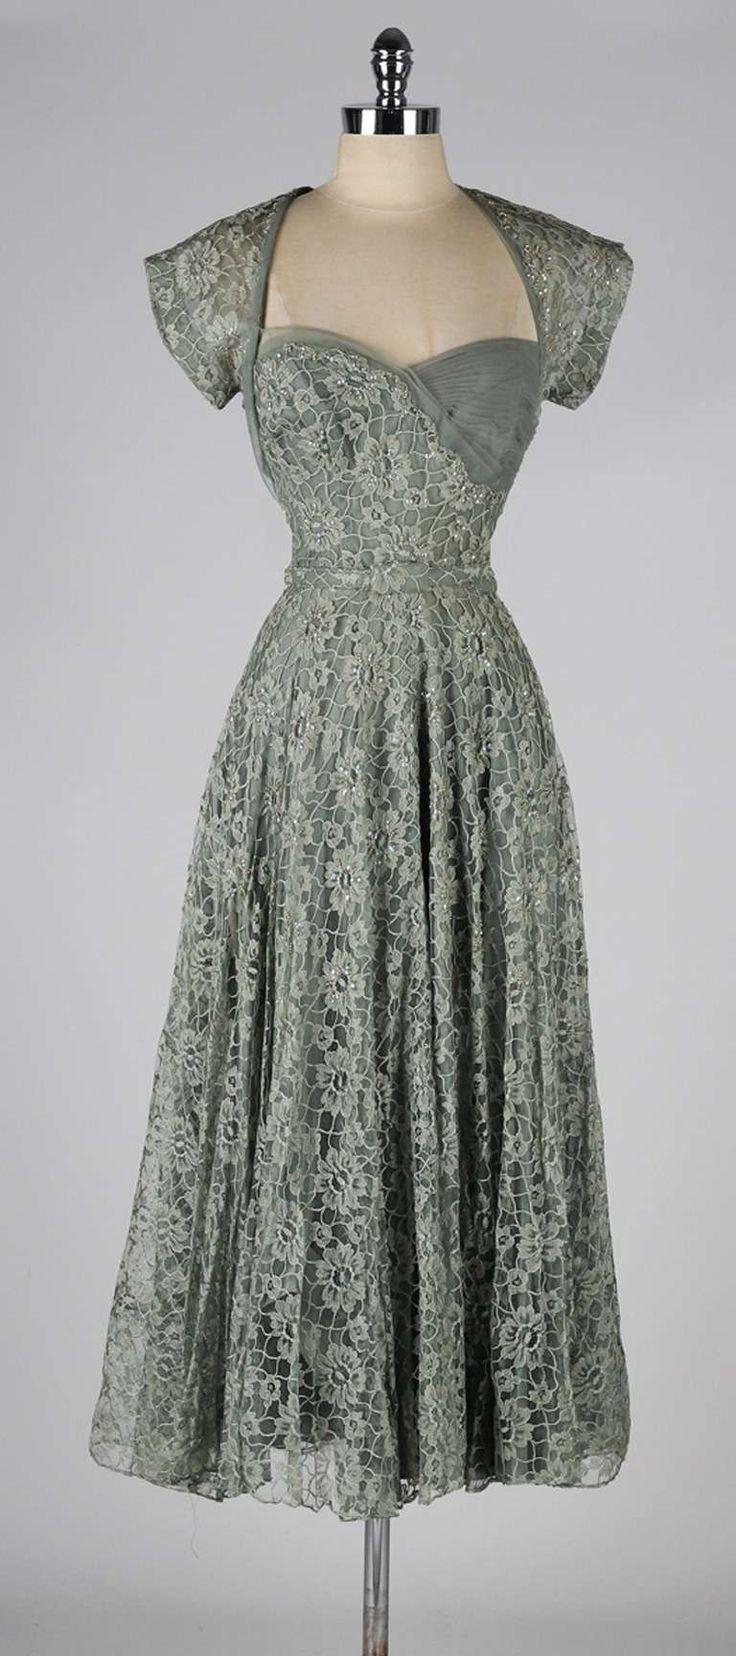 Pin by Princess Monica on mom | Pinterest | Celebrity prom dresses ...